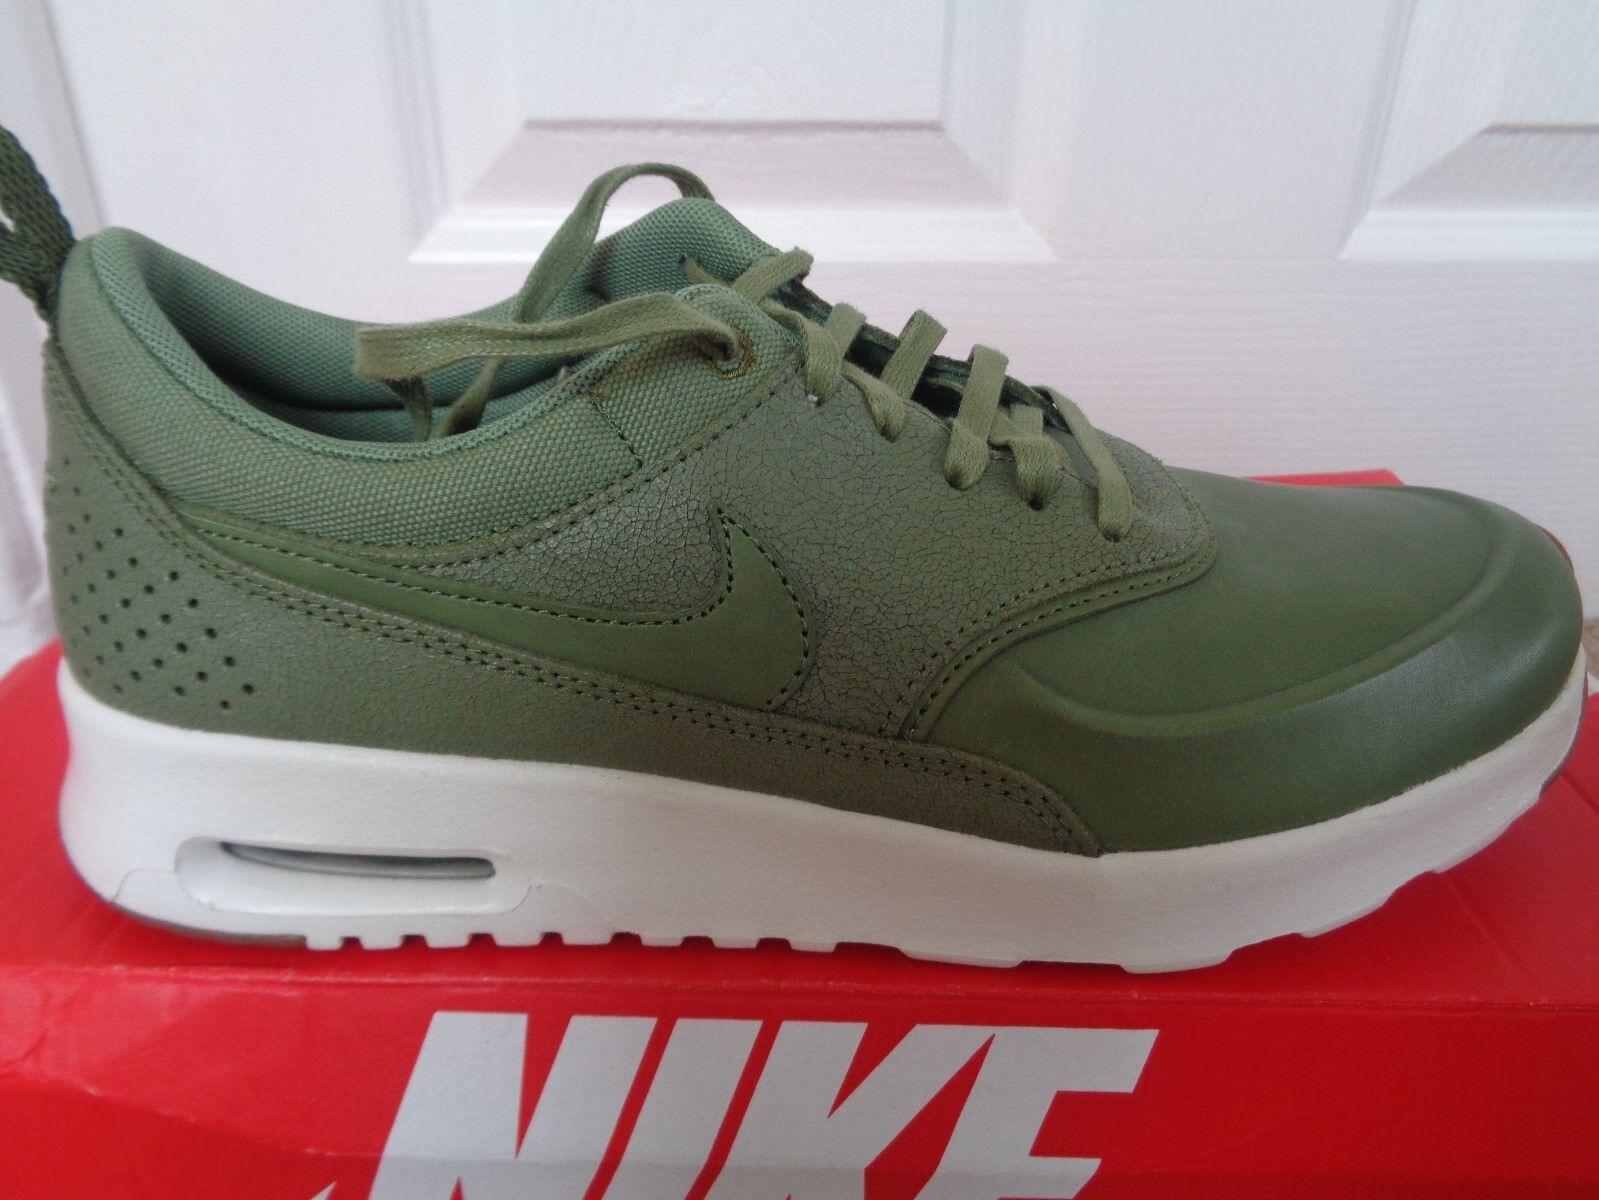 Nike Air Max Thea 305 PRM Damenss trainers 616723 305 Thea uk 5.5 eu 39 us 8 NEW+BOX af6099